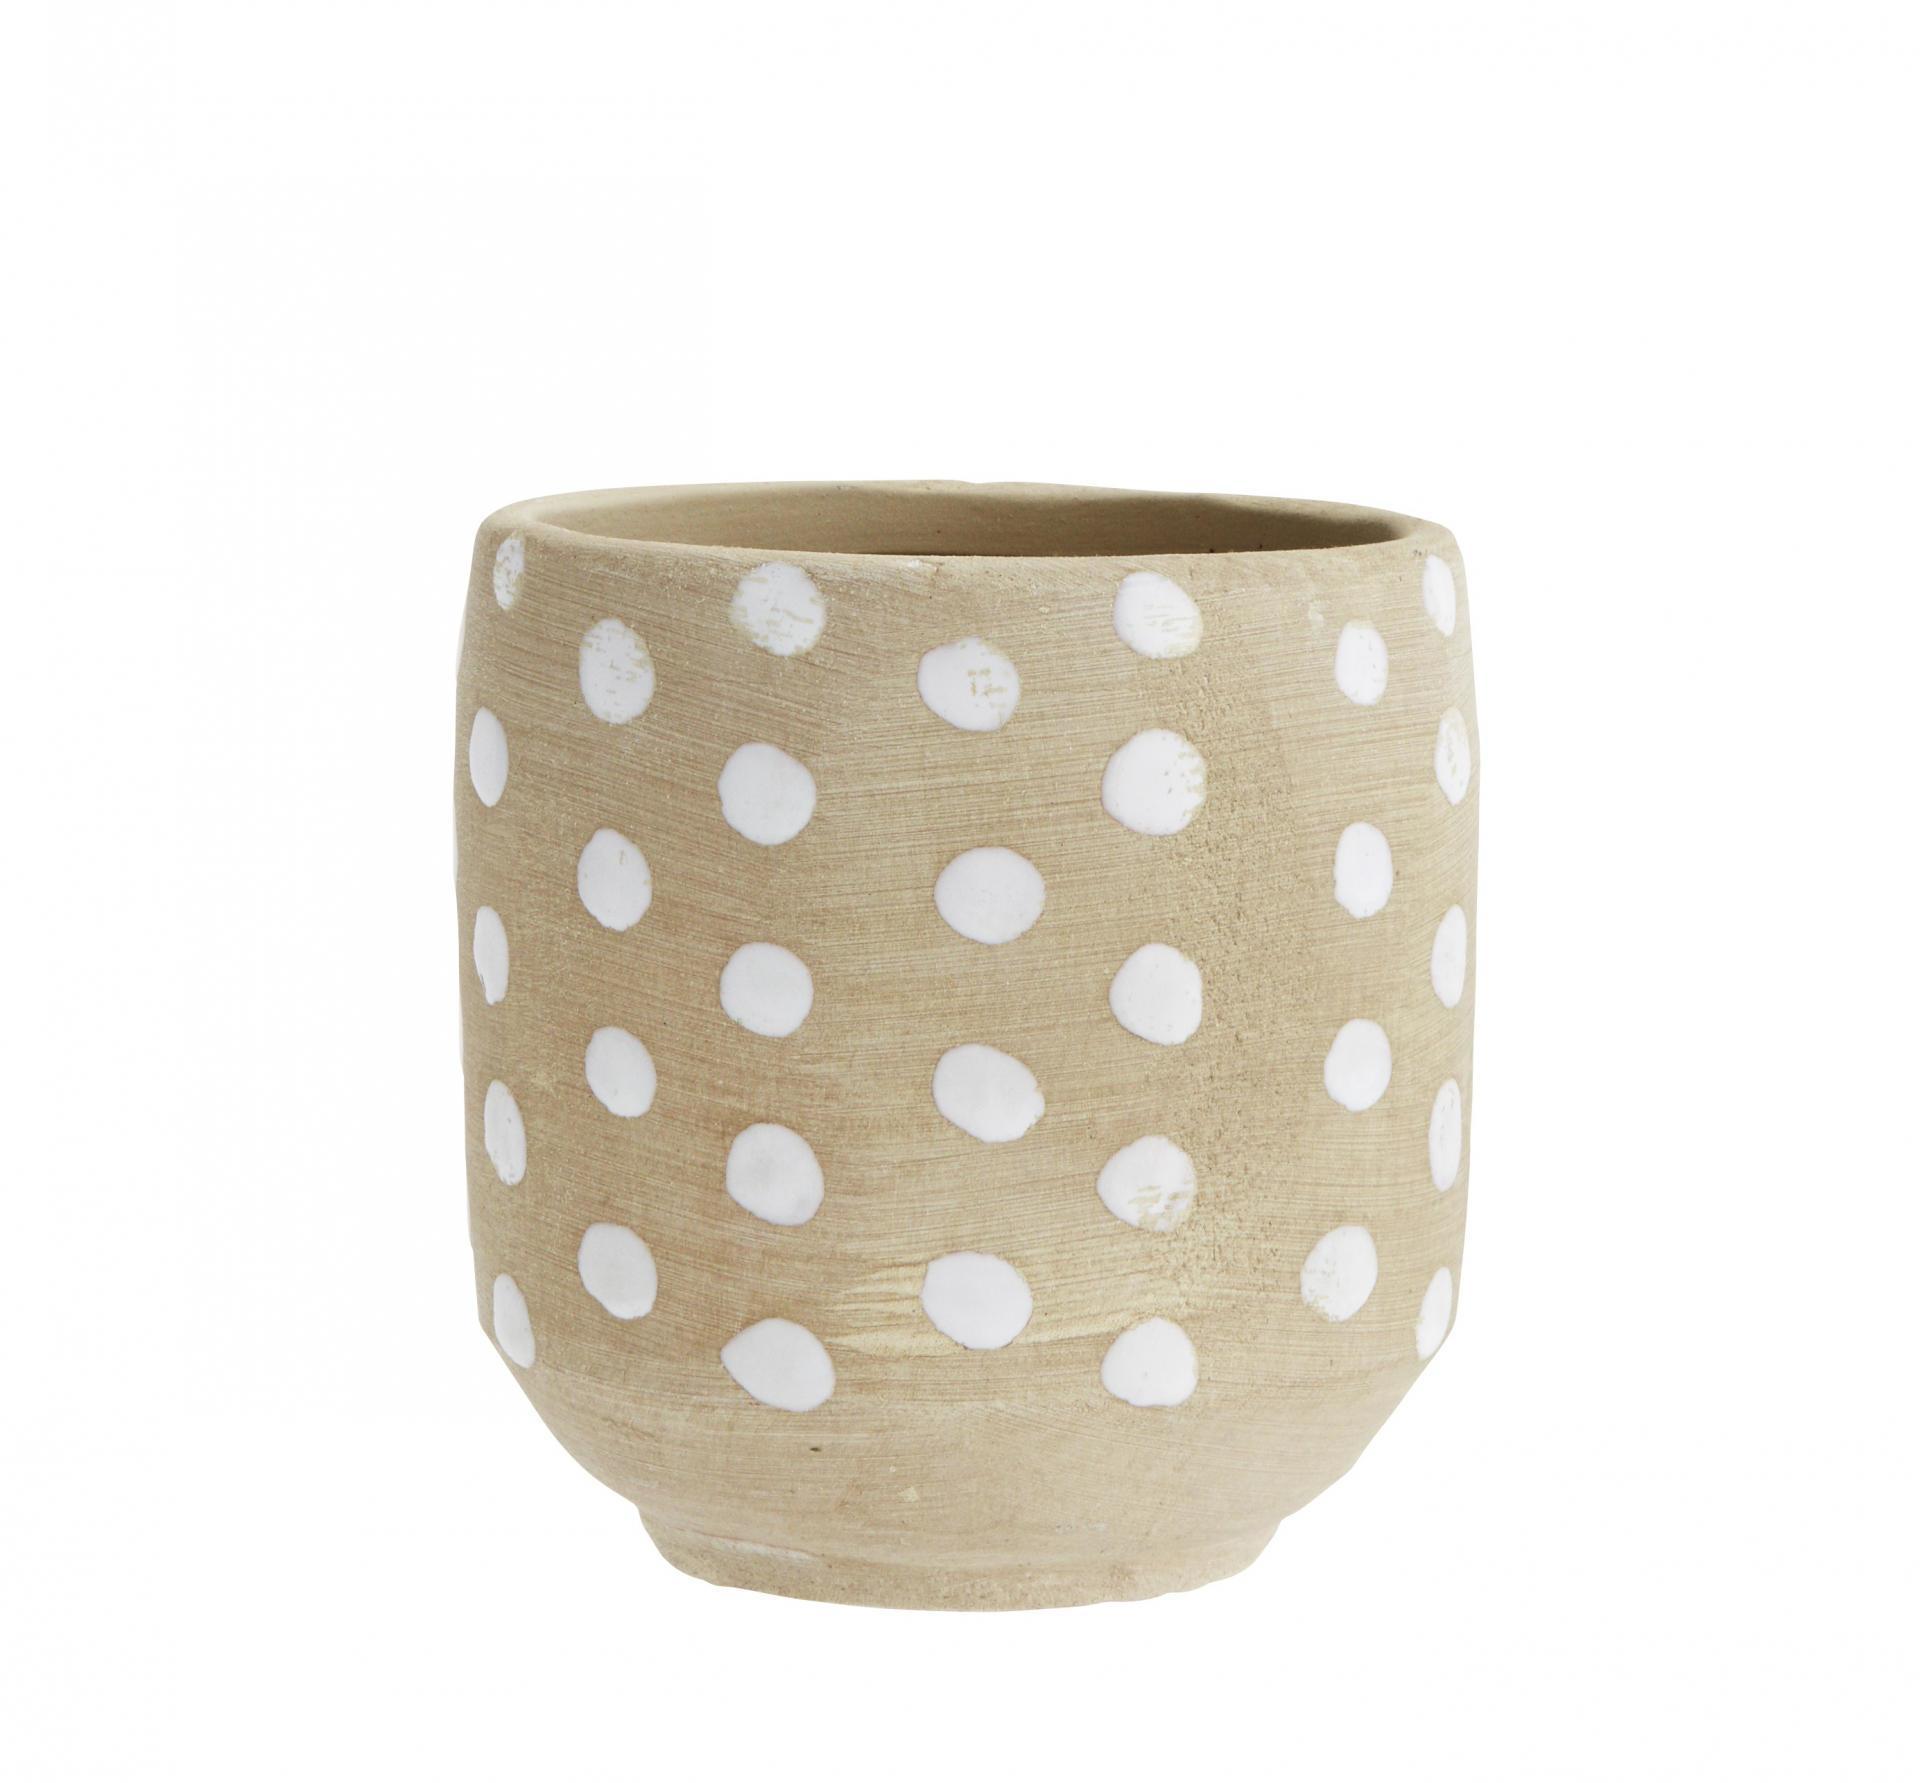 MADAM STOLTZ Keramický obal na květináč Dots, bílá barva, hnědá barva, keramika 12,5cmx14cm